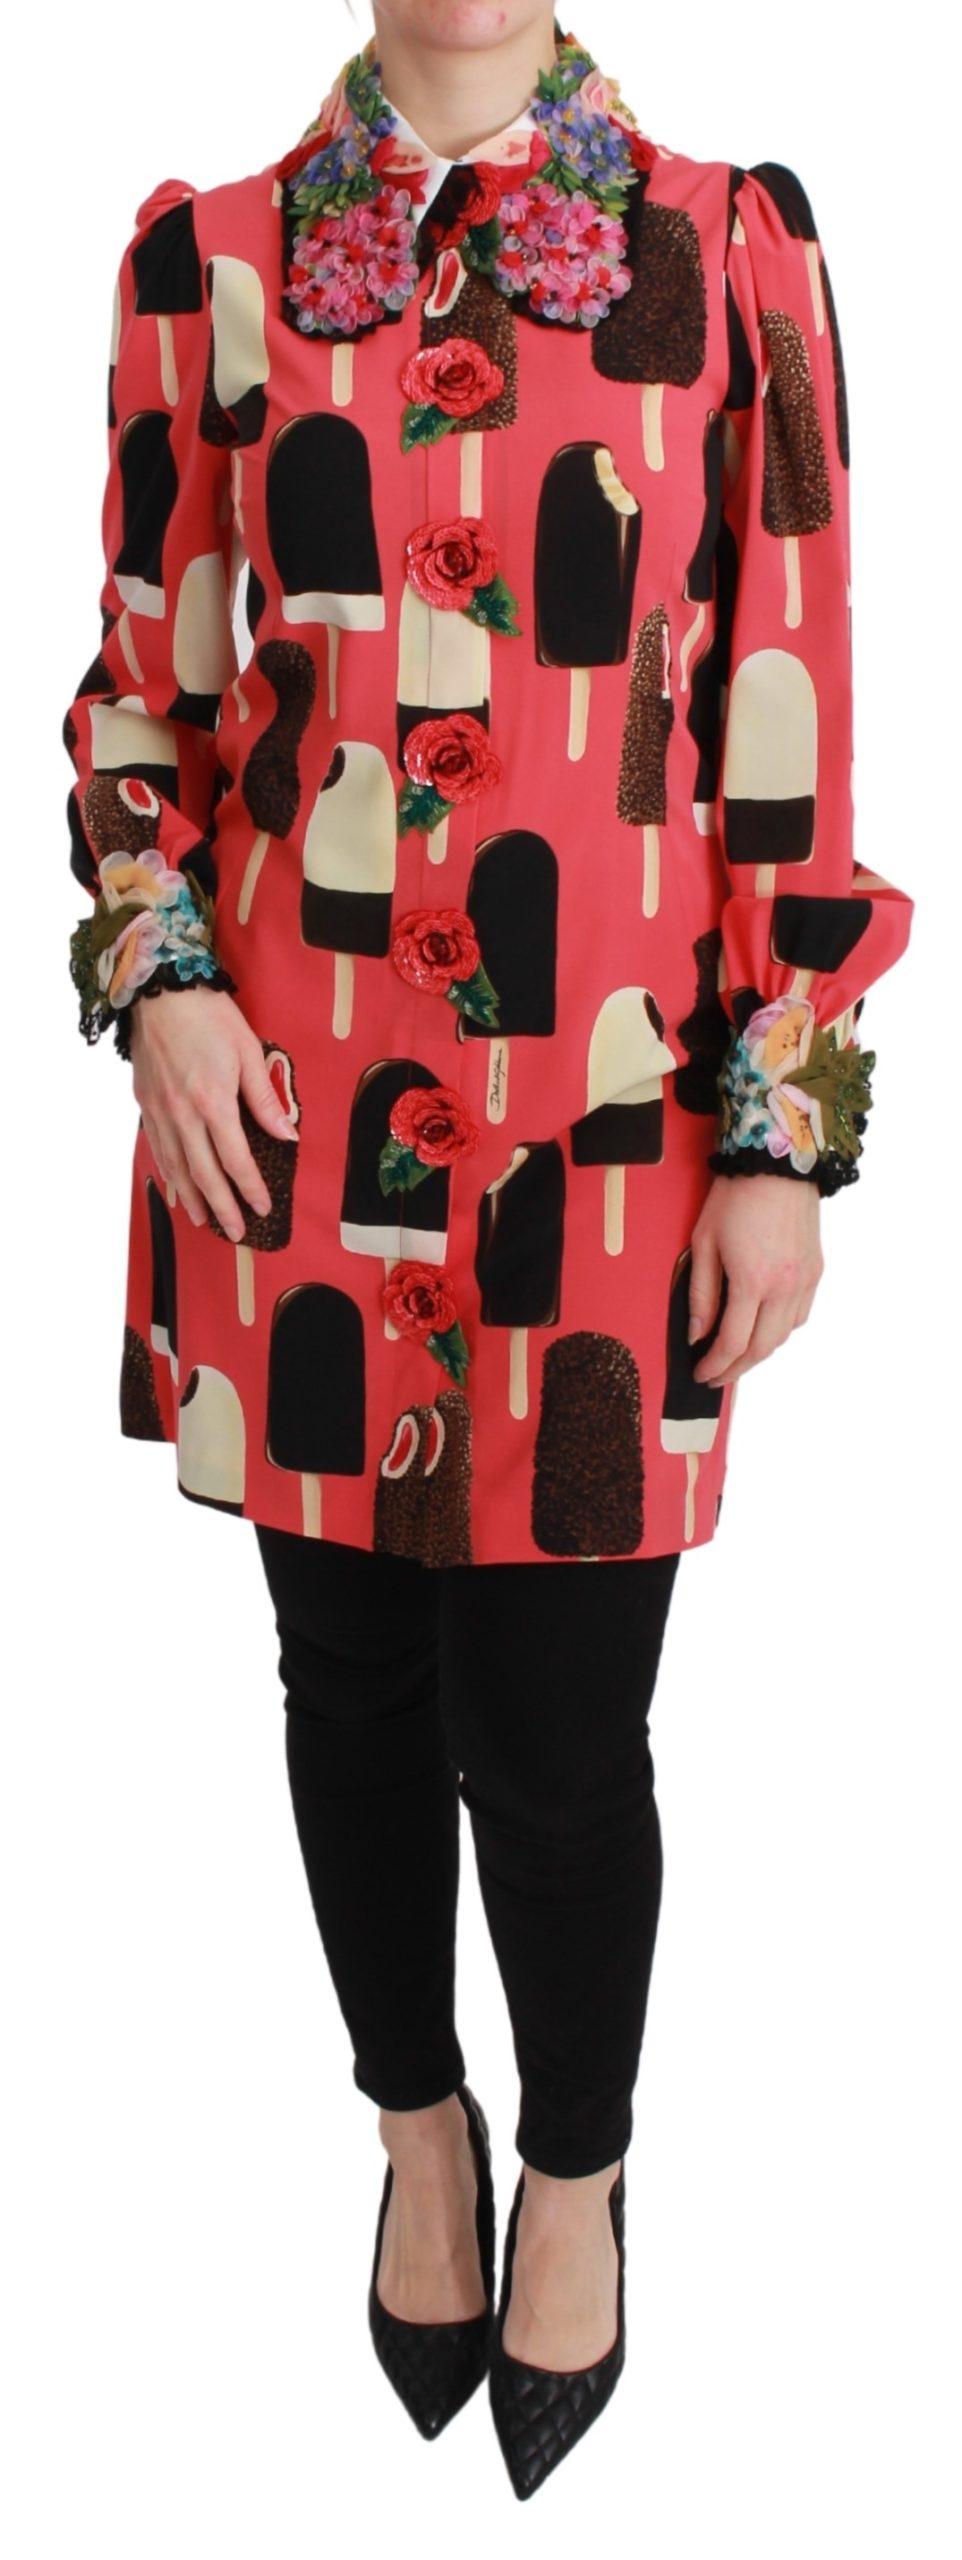 Dolce & Gabbana Women's Ice Cream Roses Sequined Dress Pink TSH2671 - IT36   XS